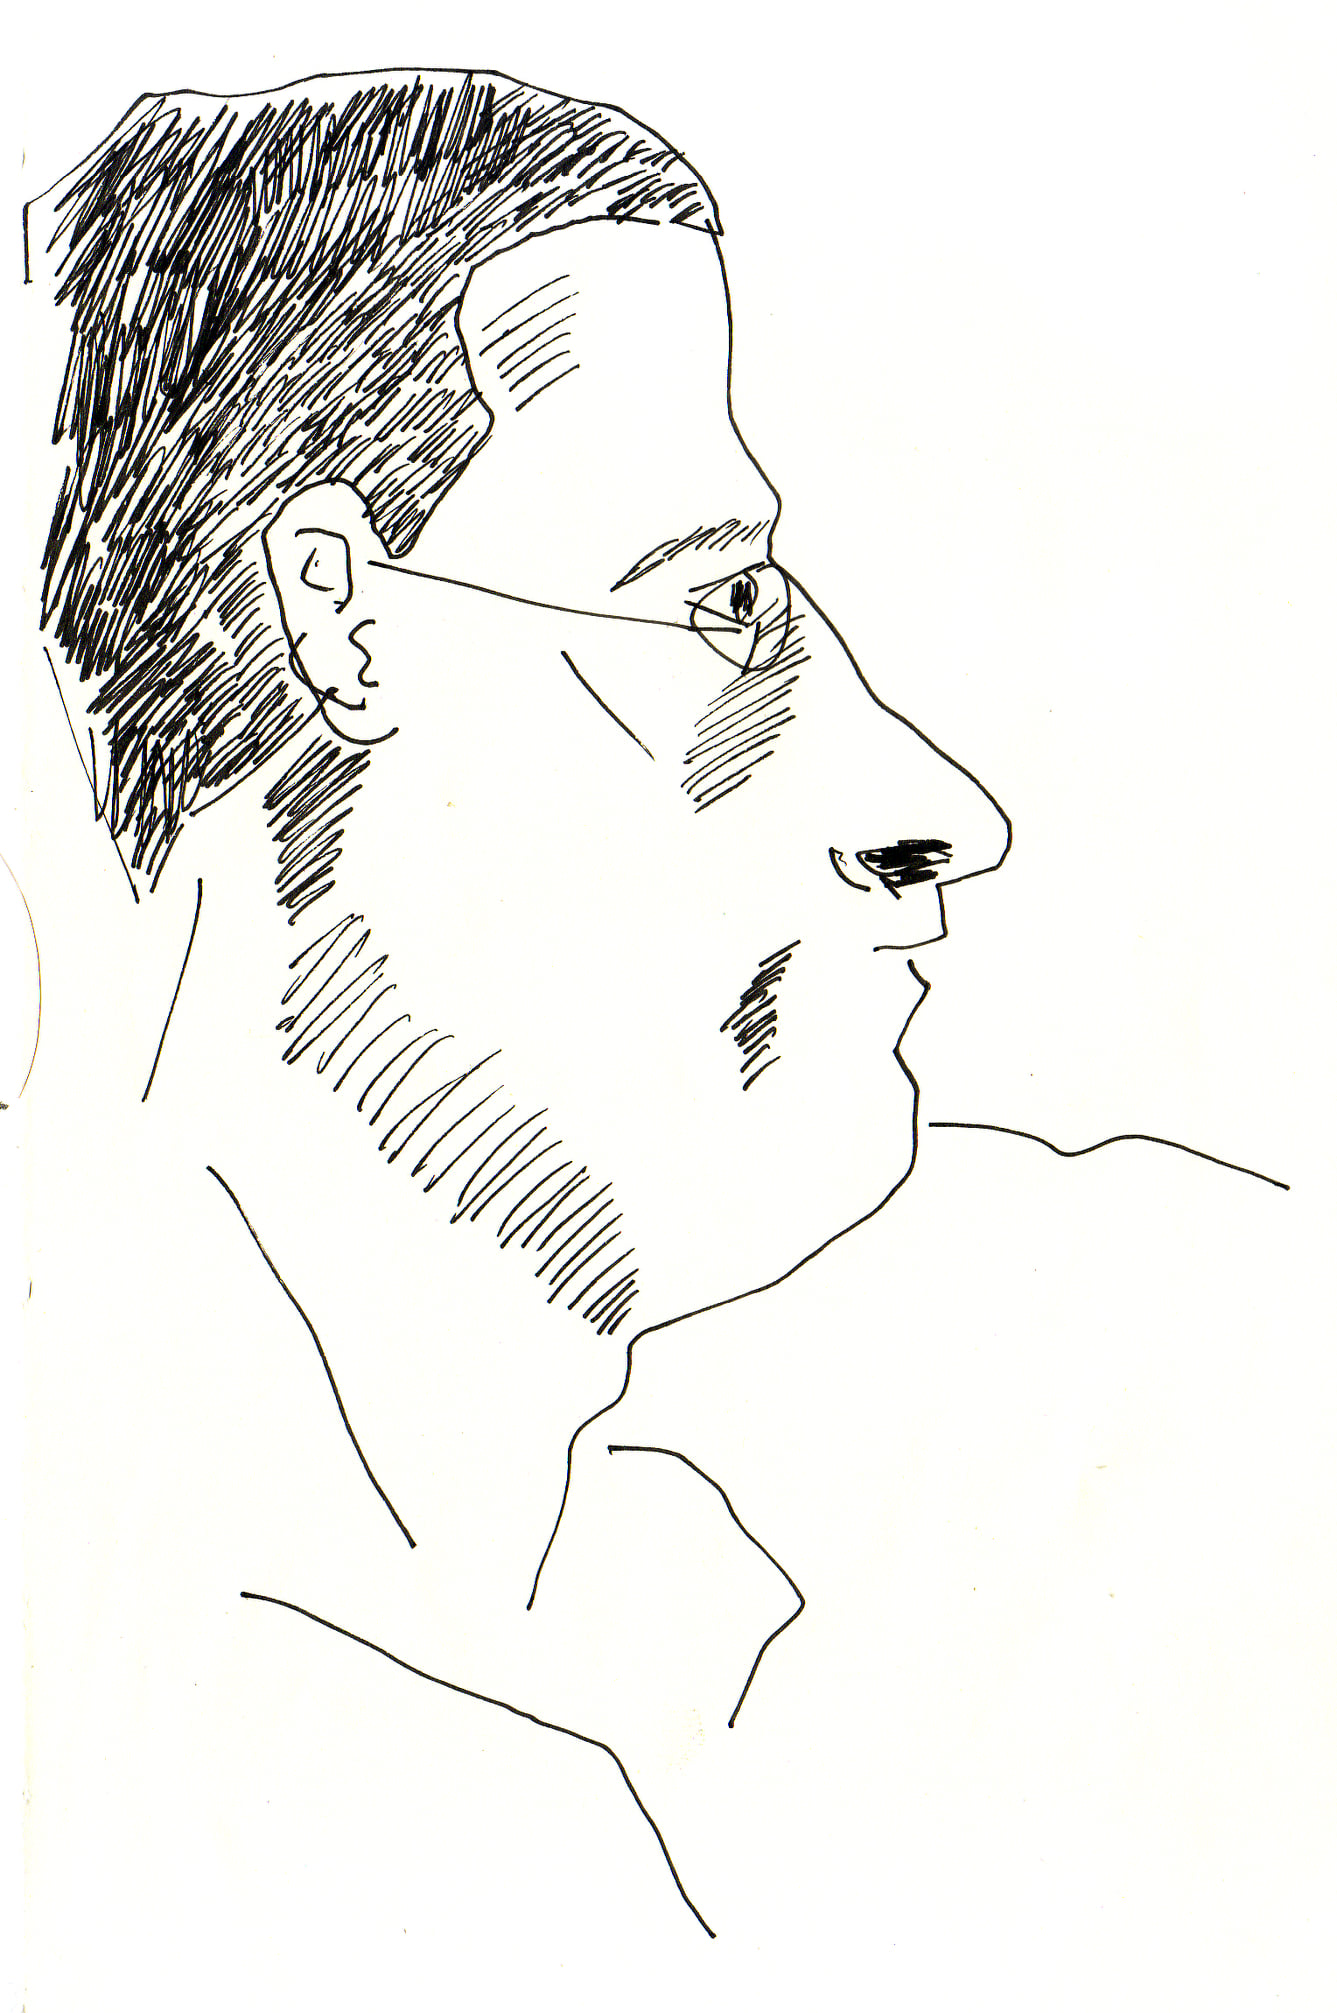 #lindarandazzo Gianni Gebbia penna su carta